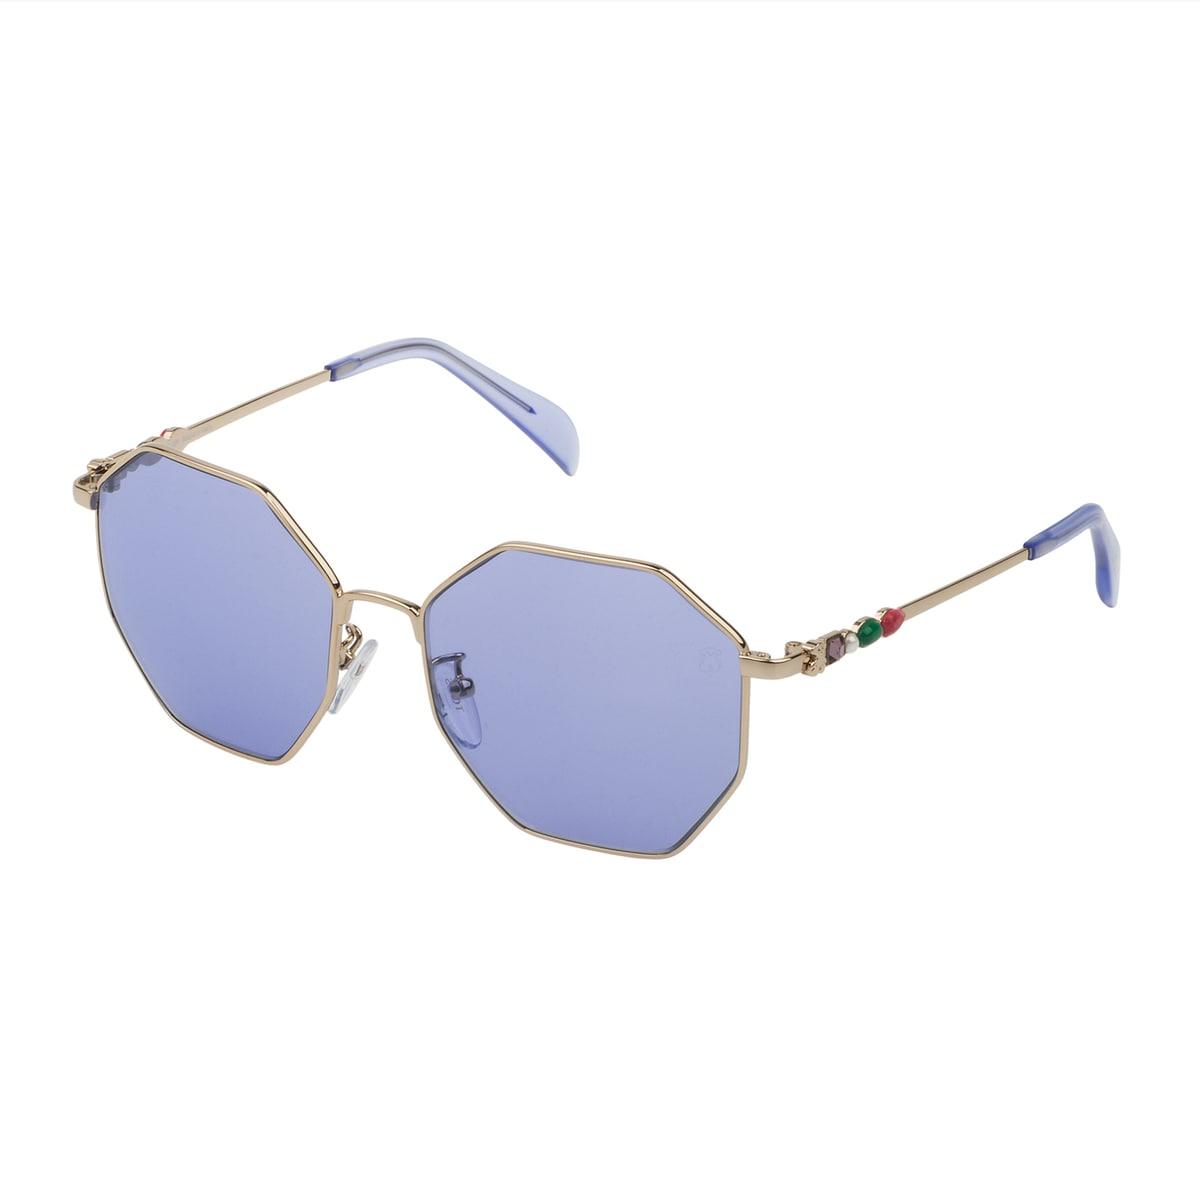 Blue Metal Jolie Seventies Sunglasses